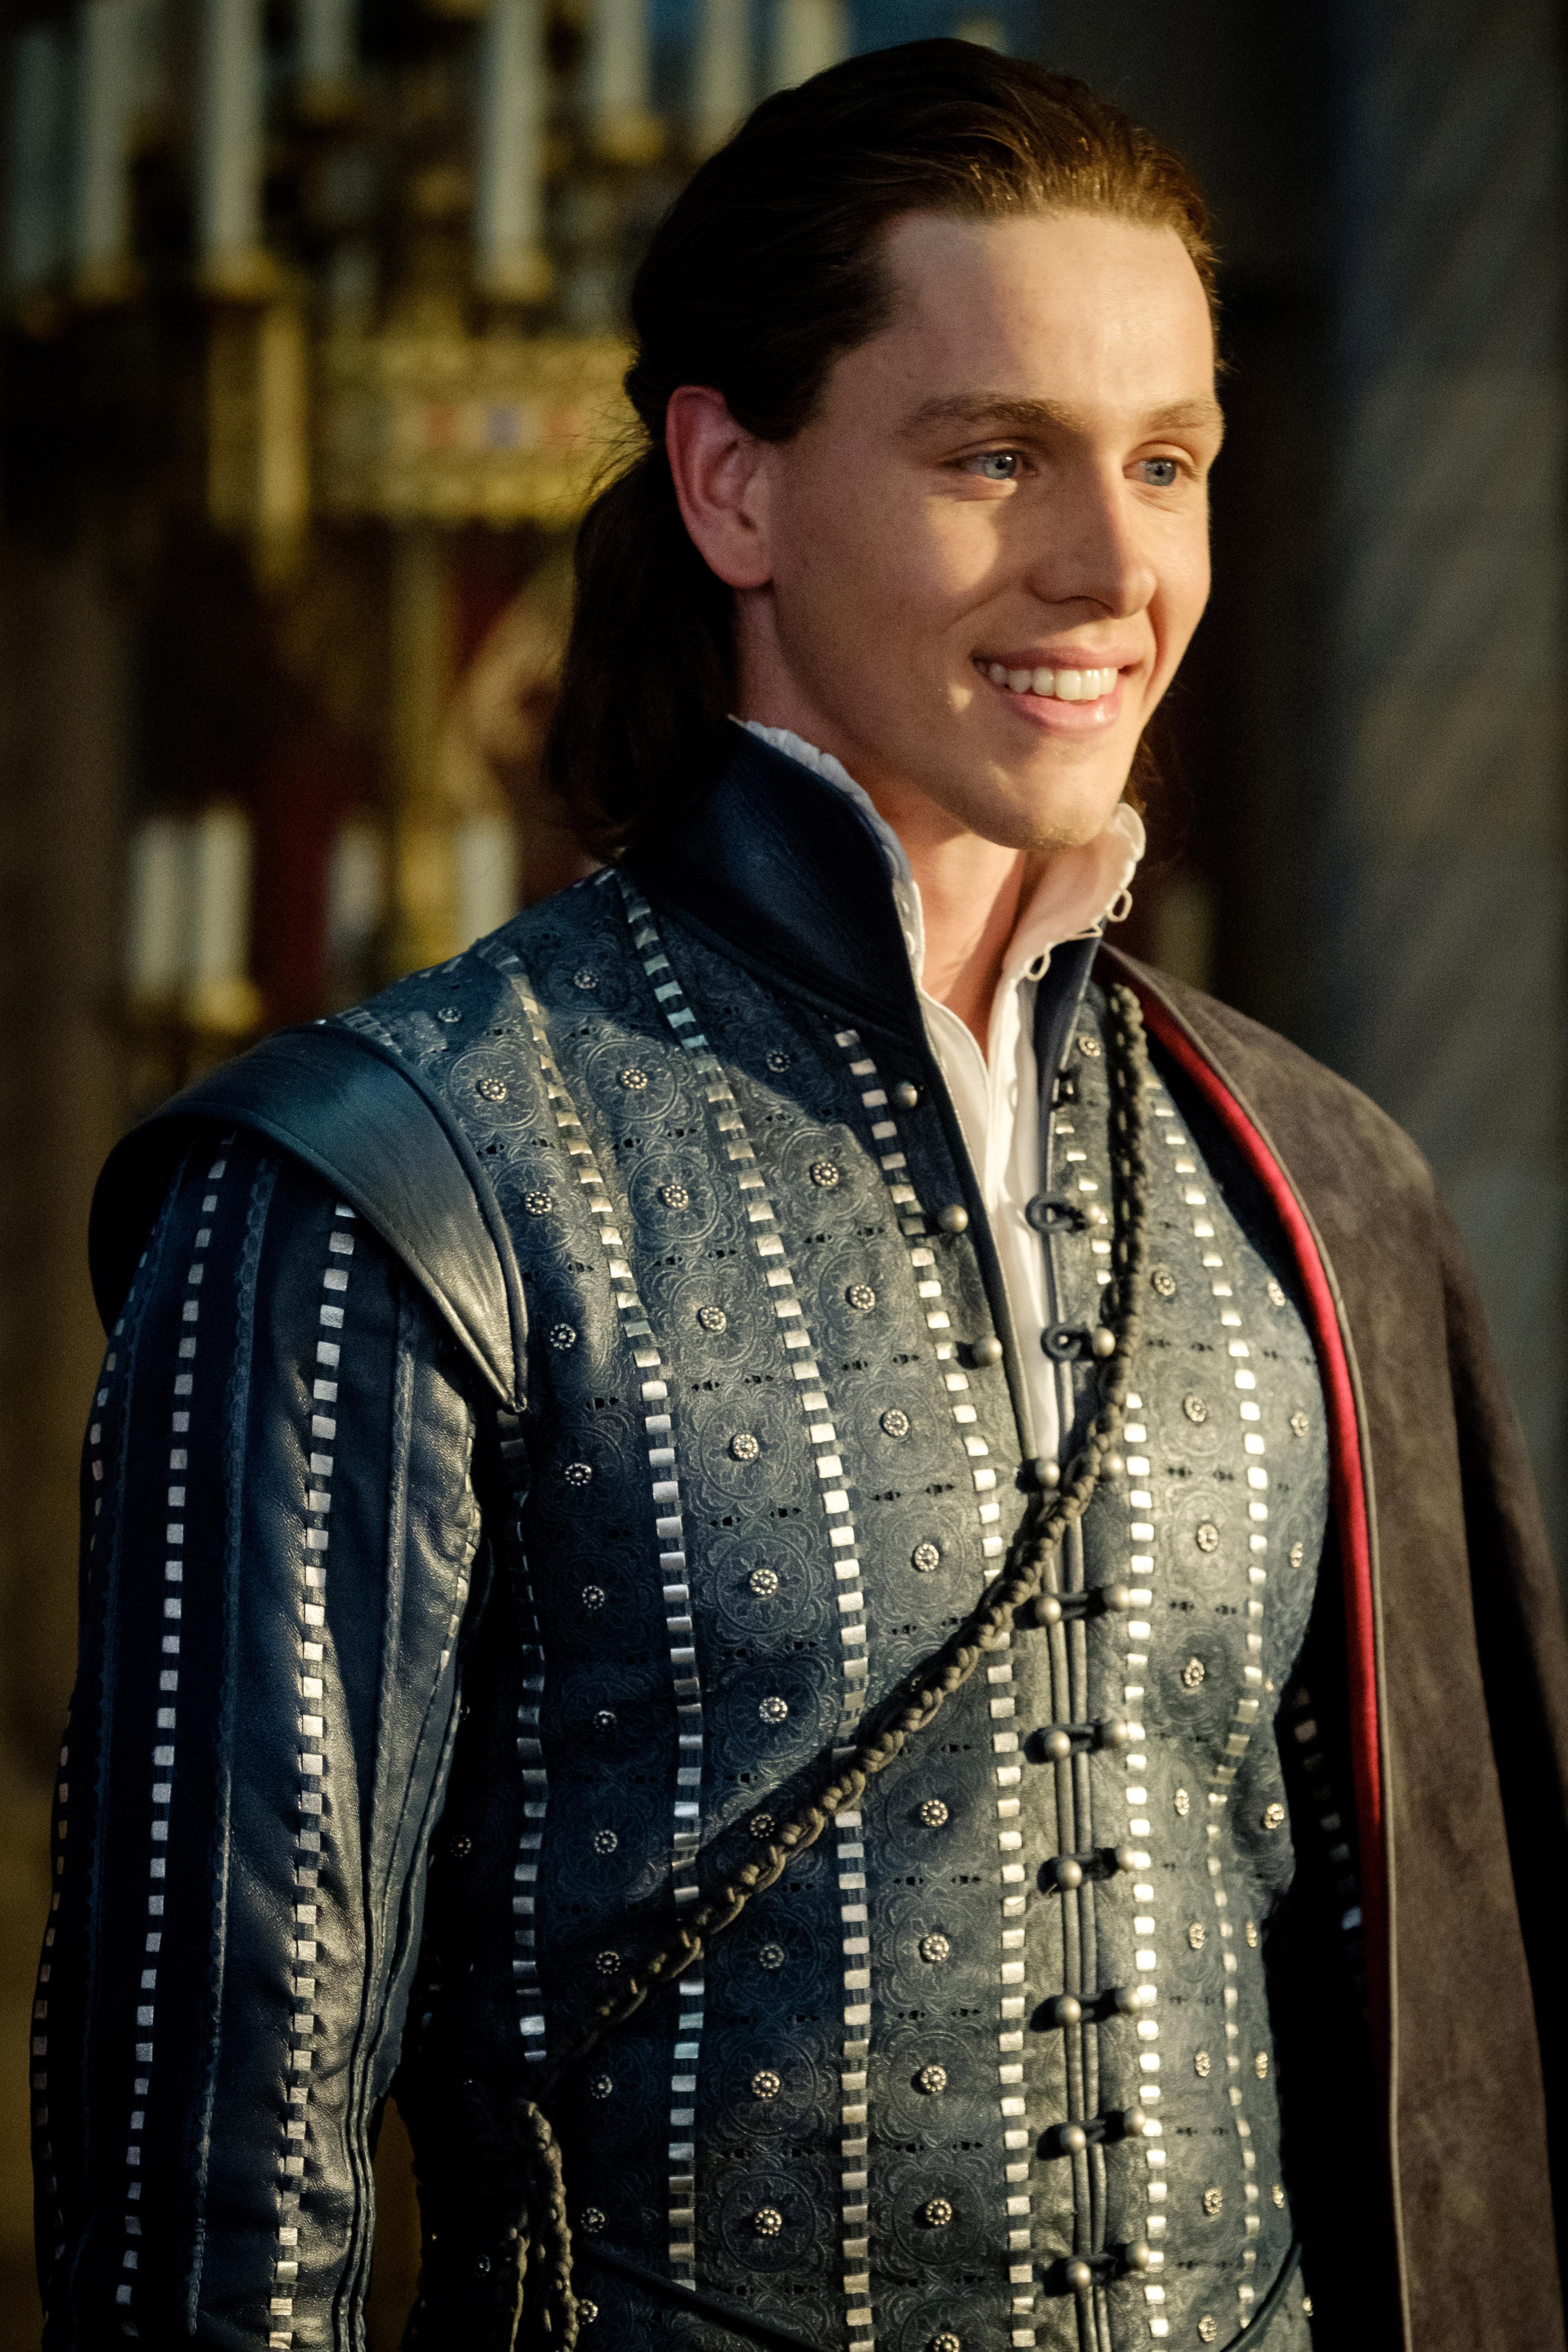 principe-philip-harris-dickinson-malevola-dona-do-mal